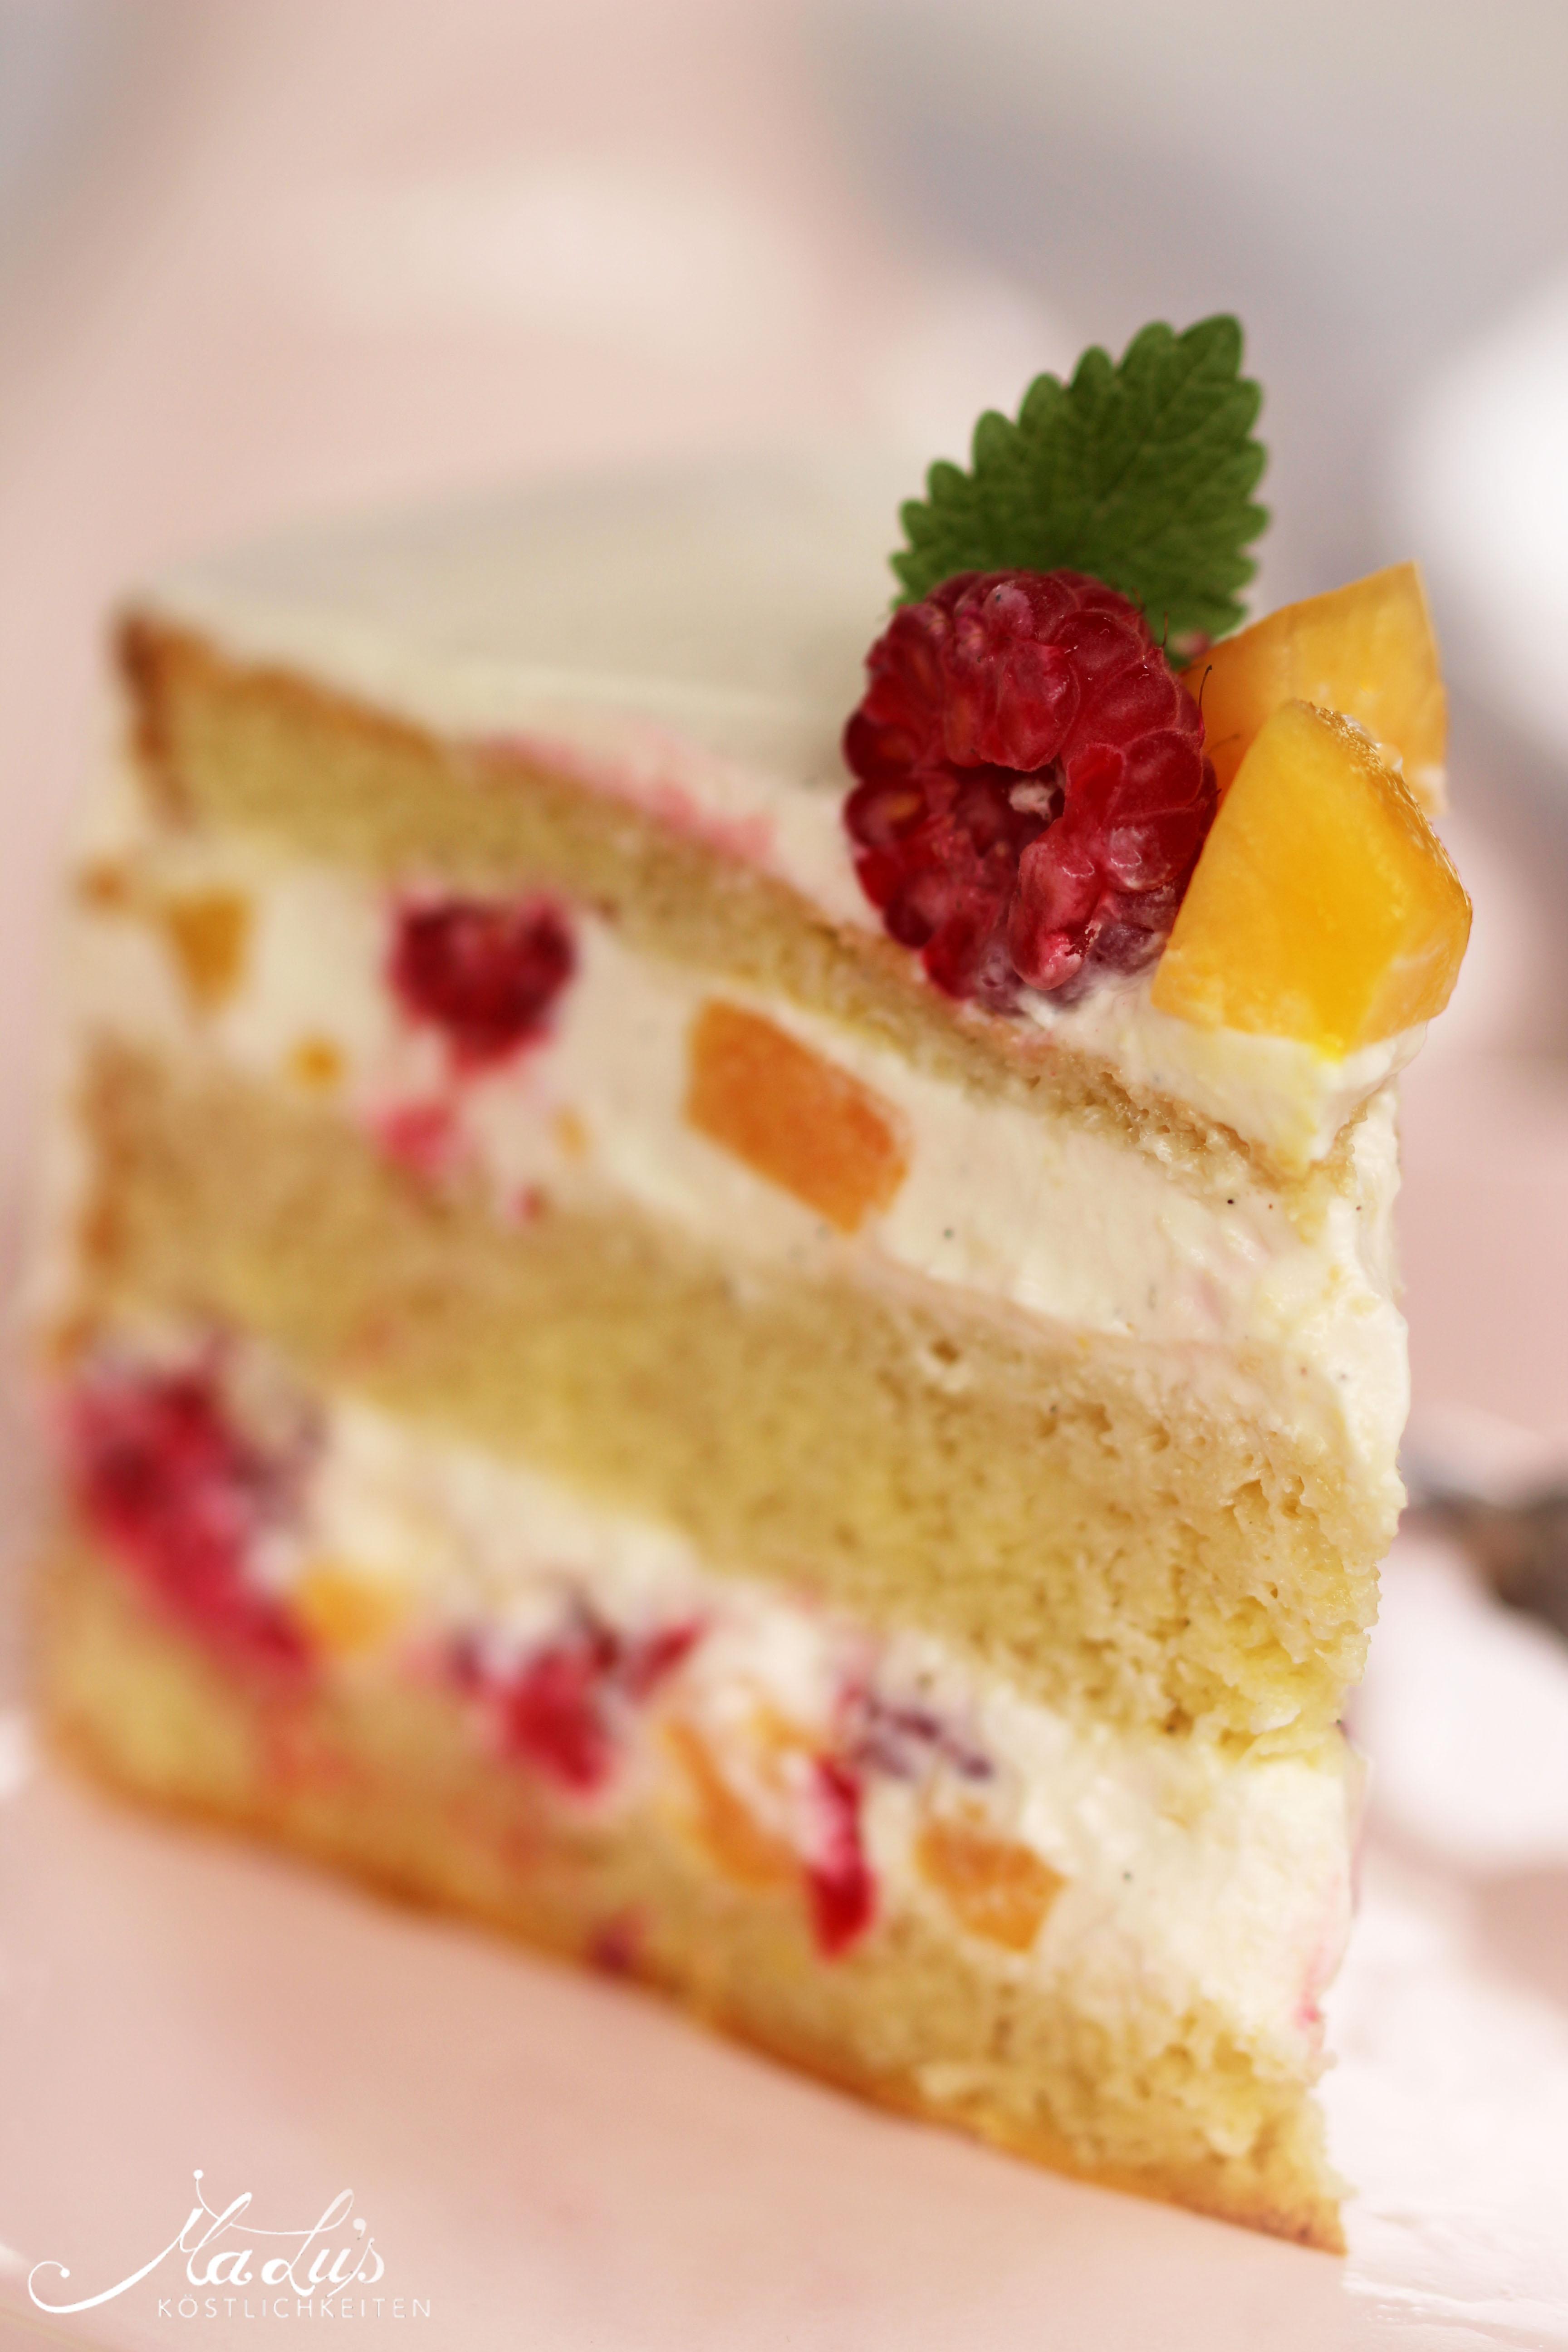 Peach Melba Torte by Maren Lubbe